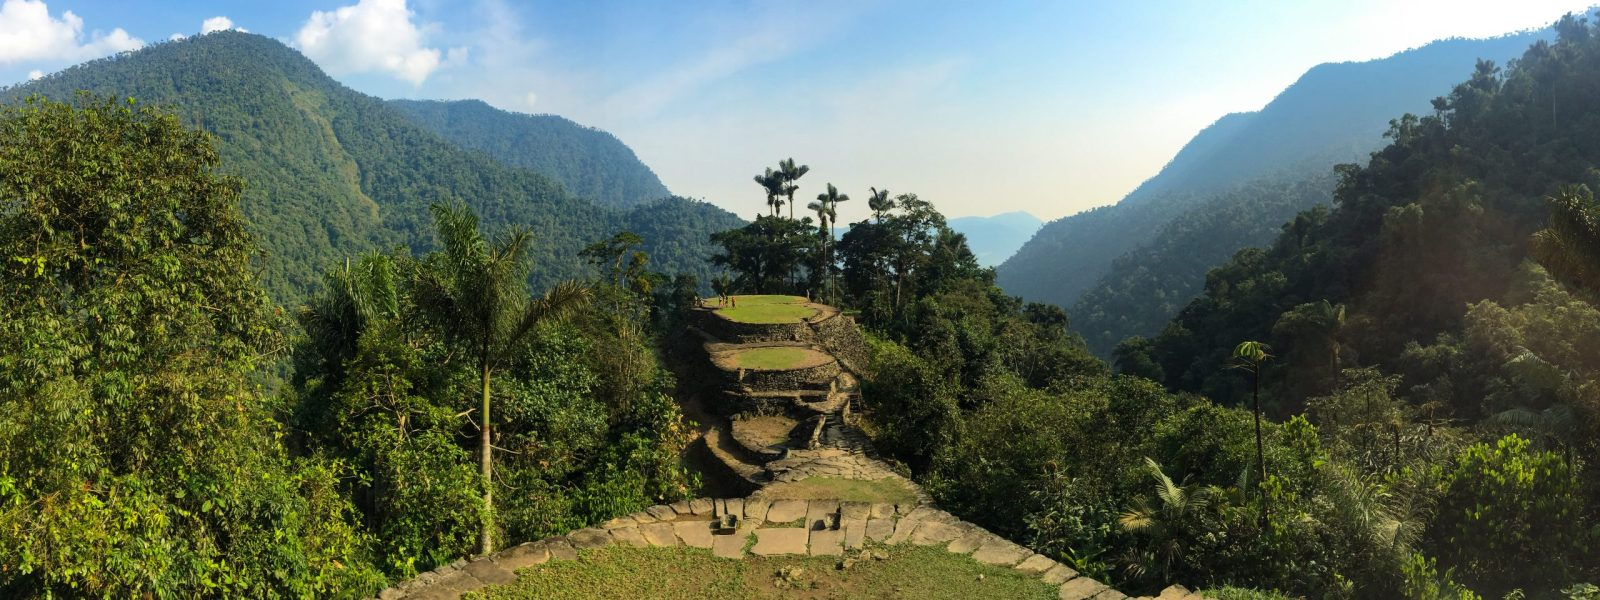 Lost City Trek in Colombia: junglehike naar Ciudad Perdida